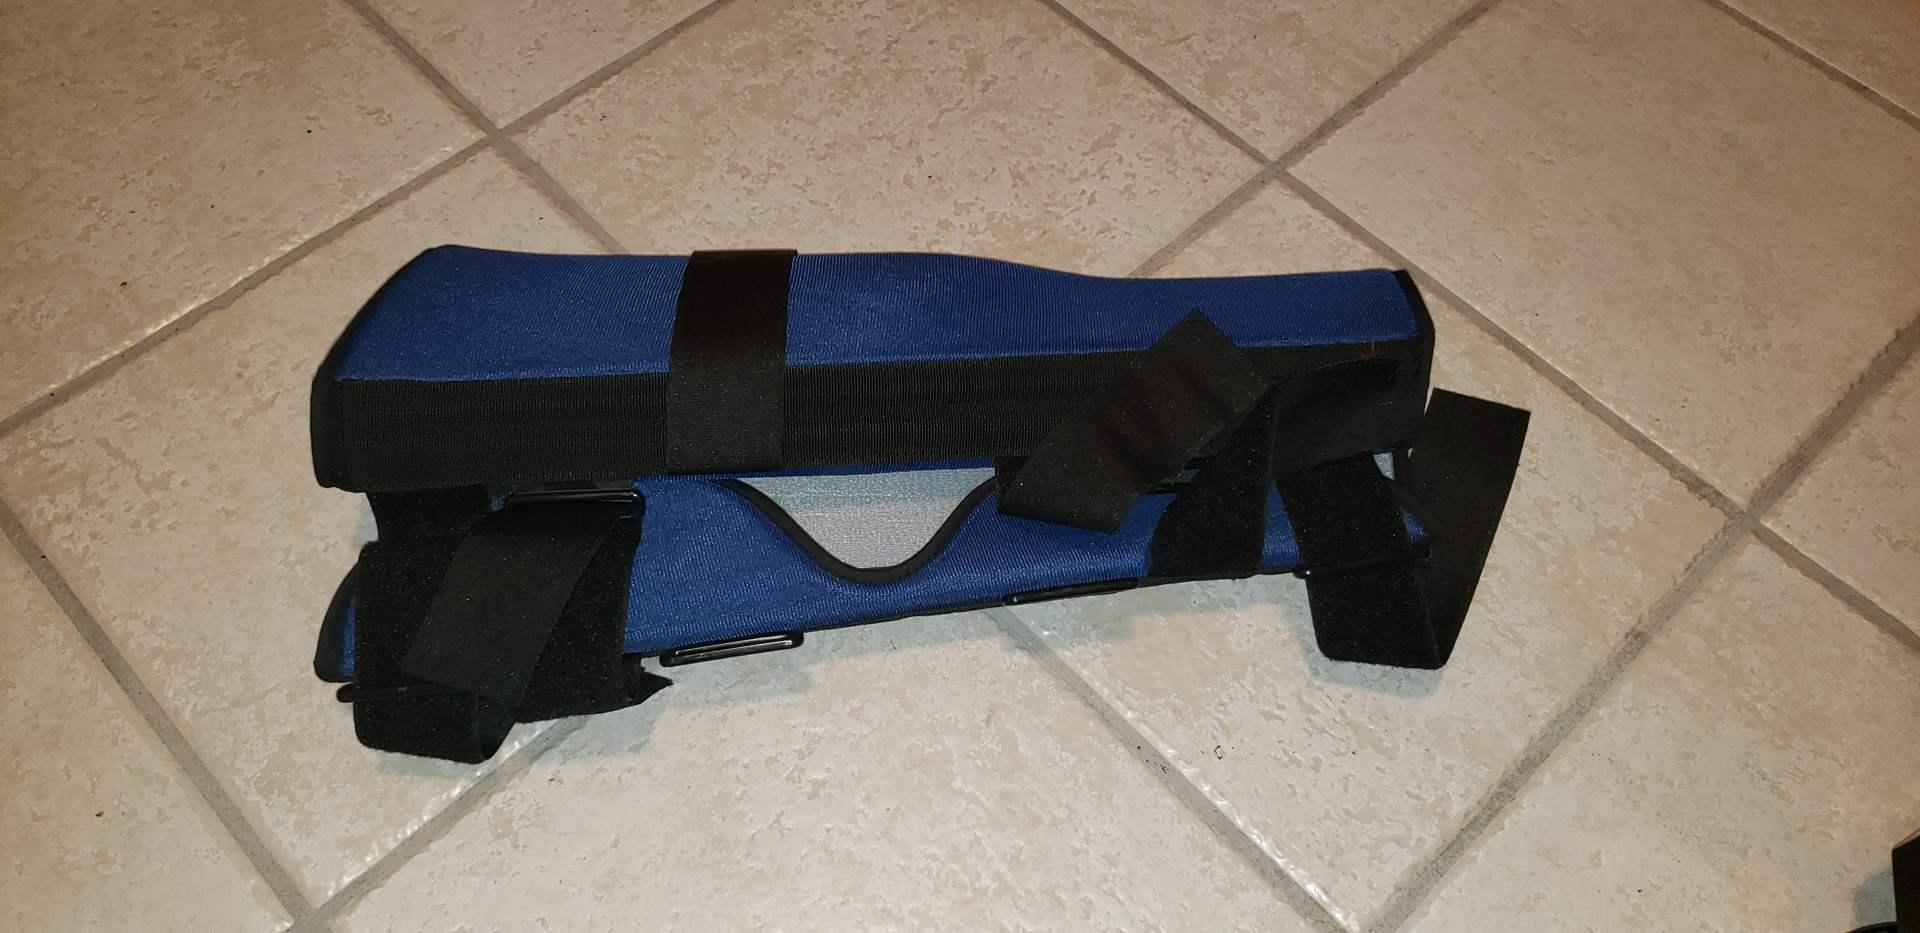 Lot # 424 Knee Brace - Like New - Size Large